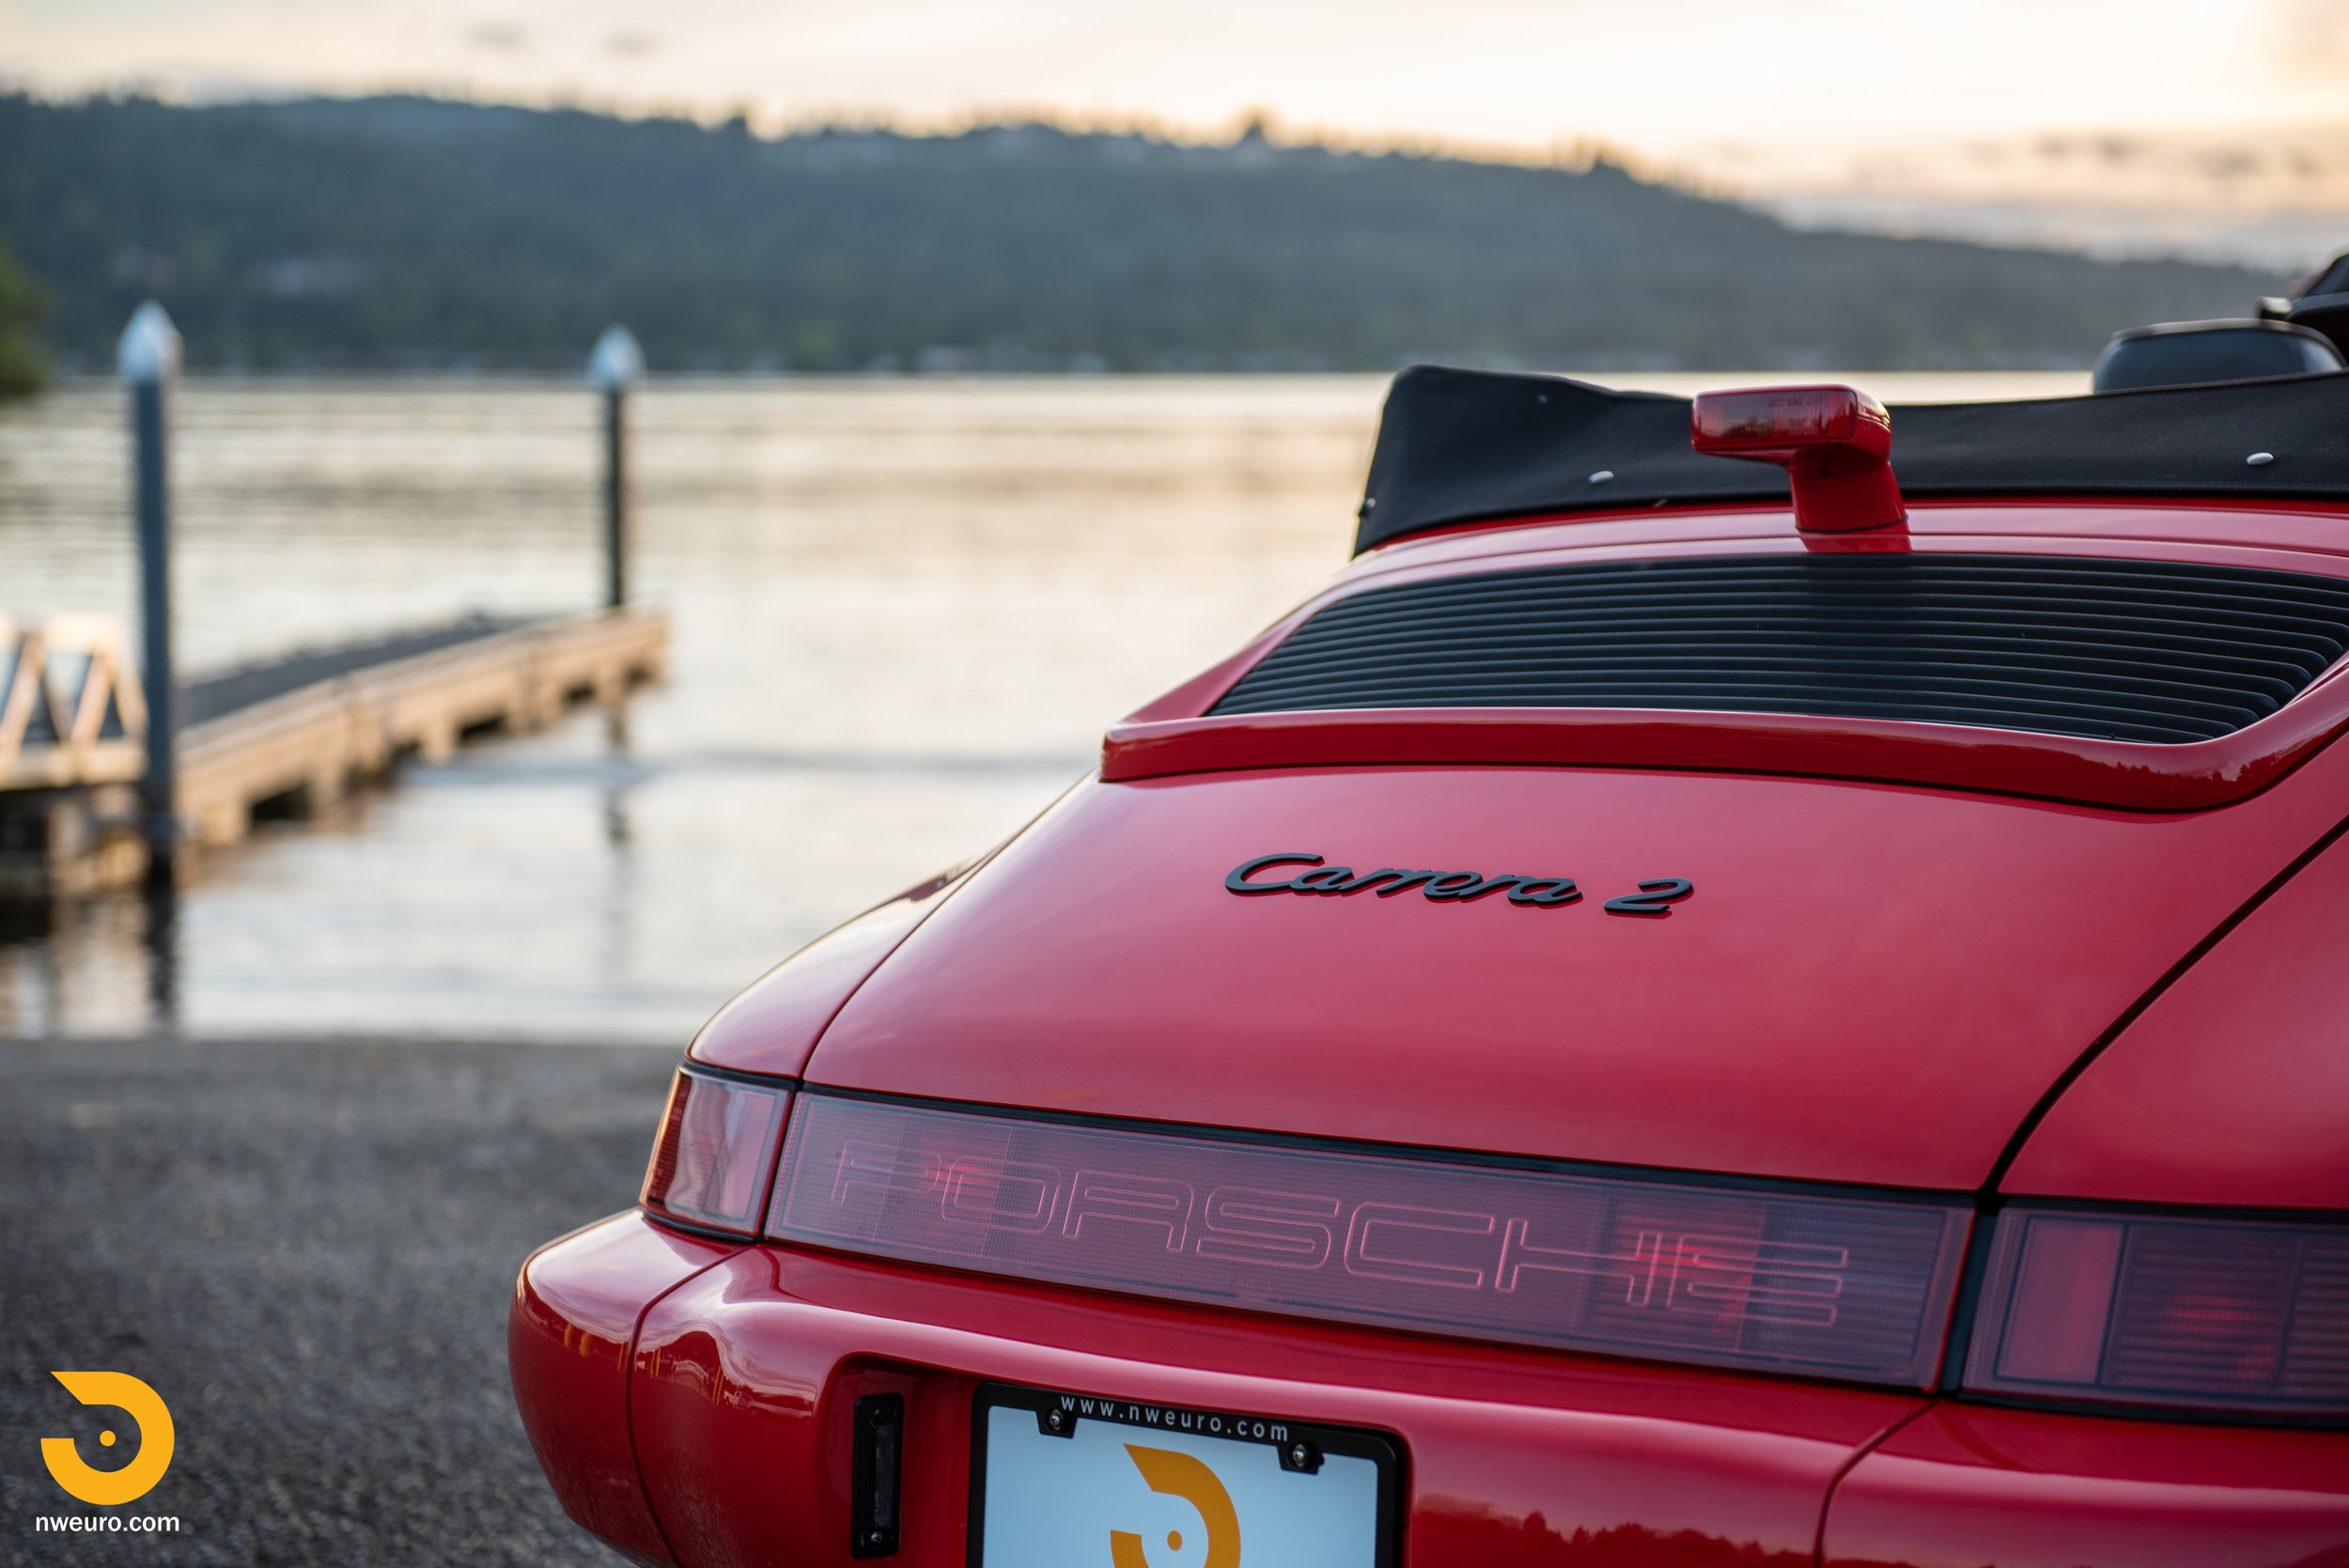 1990 Porsche Carrera 2 Cabriolet-13.jpg